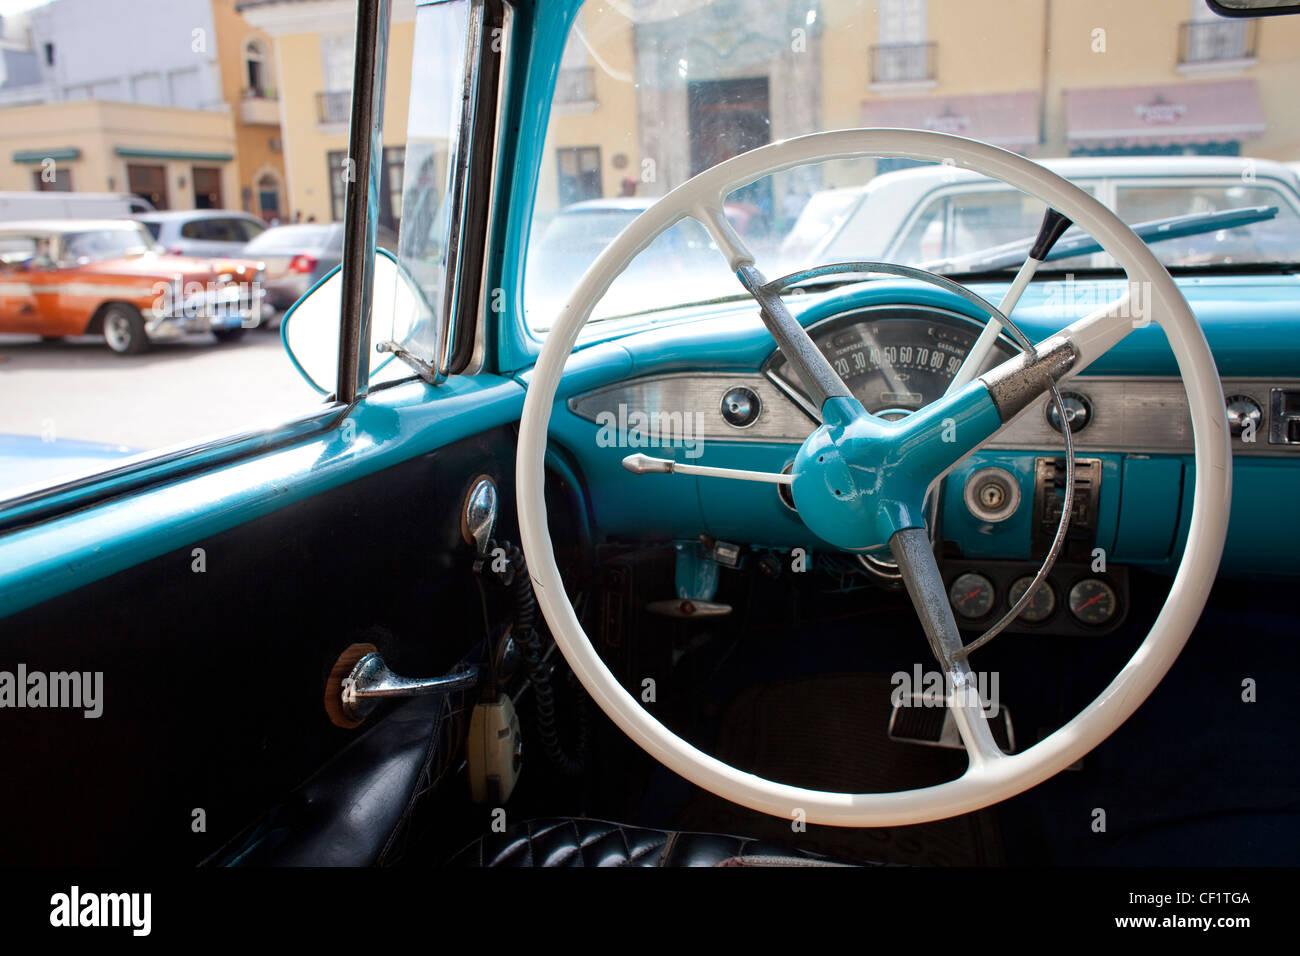 1950s car interior stock photos 1950s car interior stock images